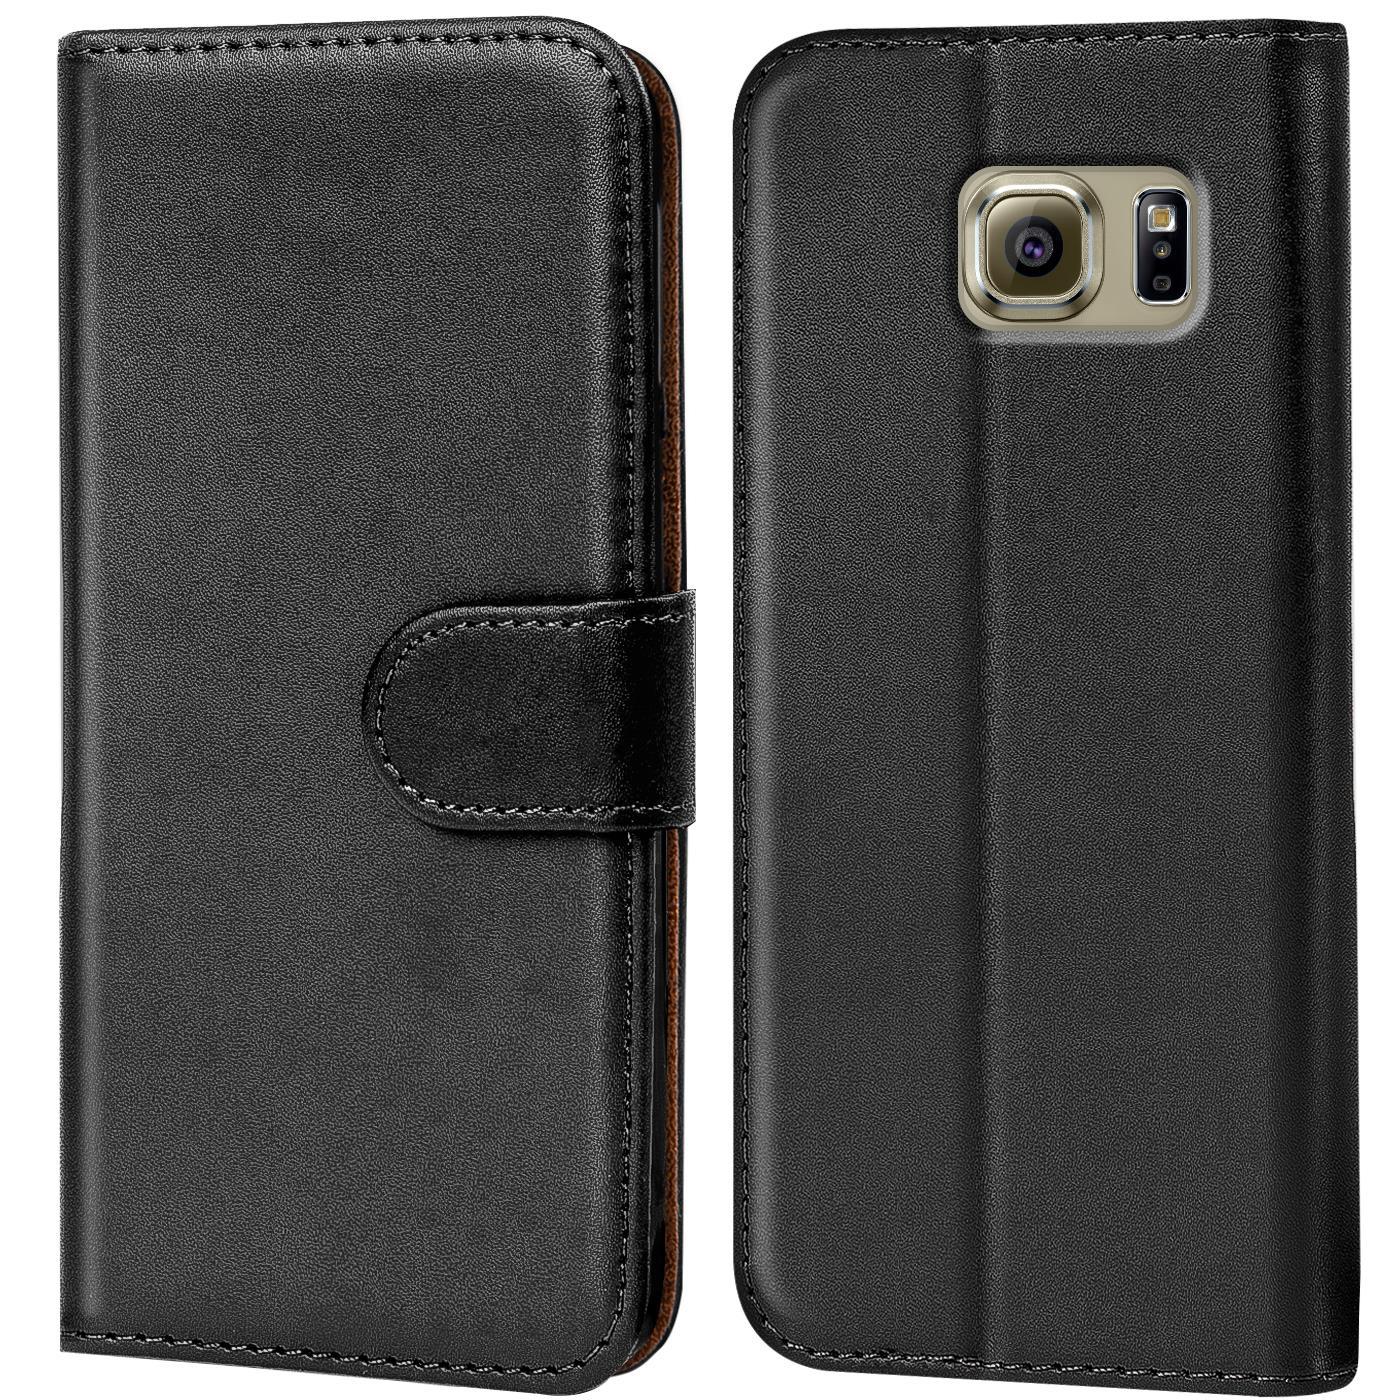 Book-Case-Samsung-Galaxy-s6-edge-Plus-Sac-etui-Flip-Cover-pour-Telephone-Portable-etui-Noir